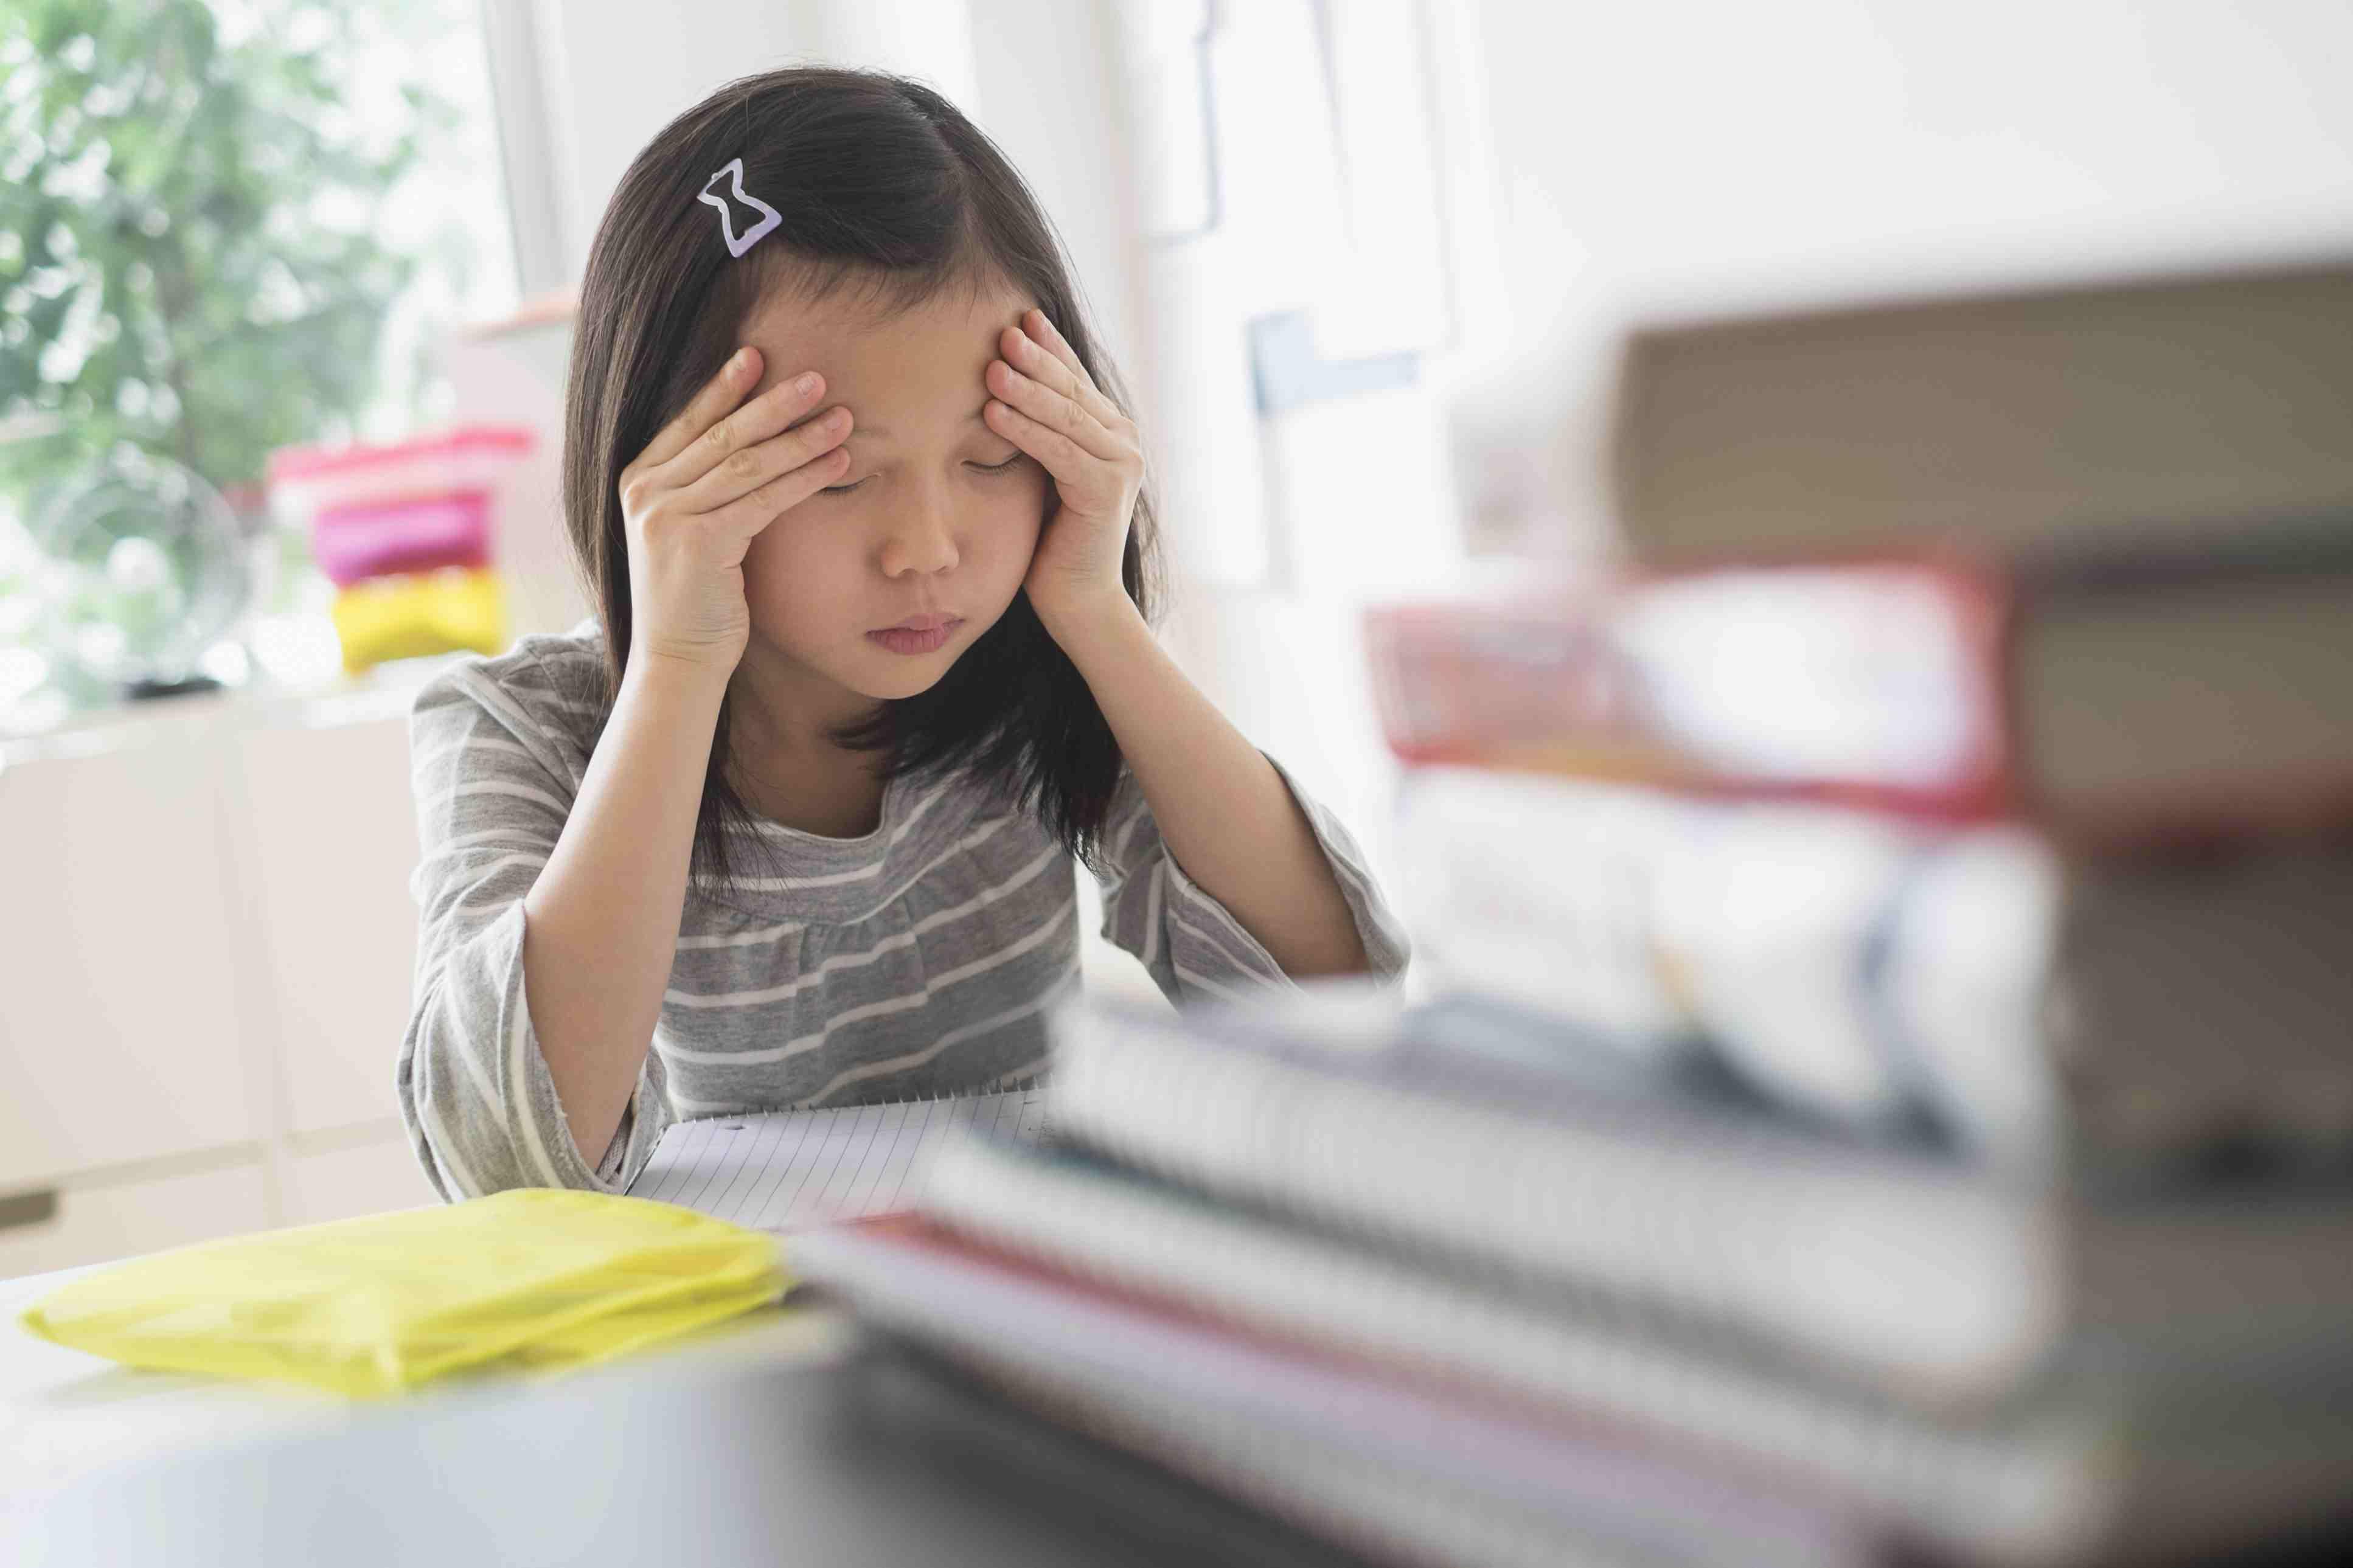 Girl with a headache